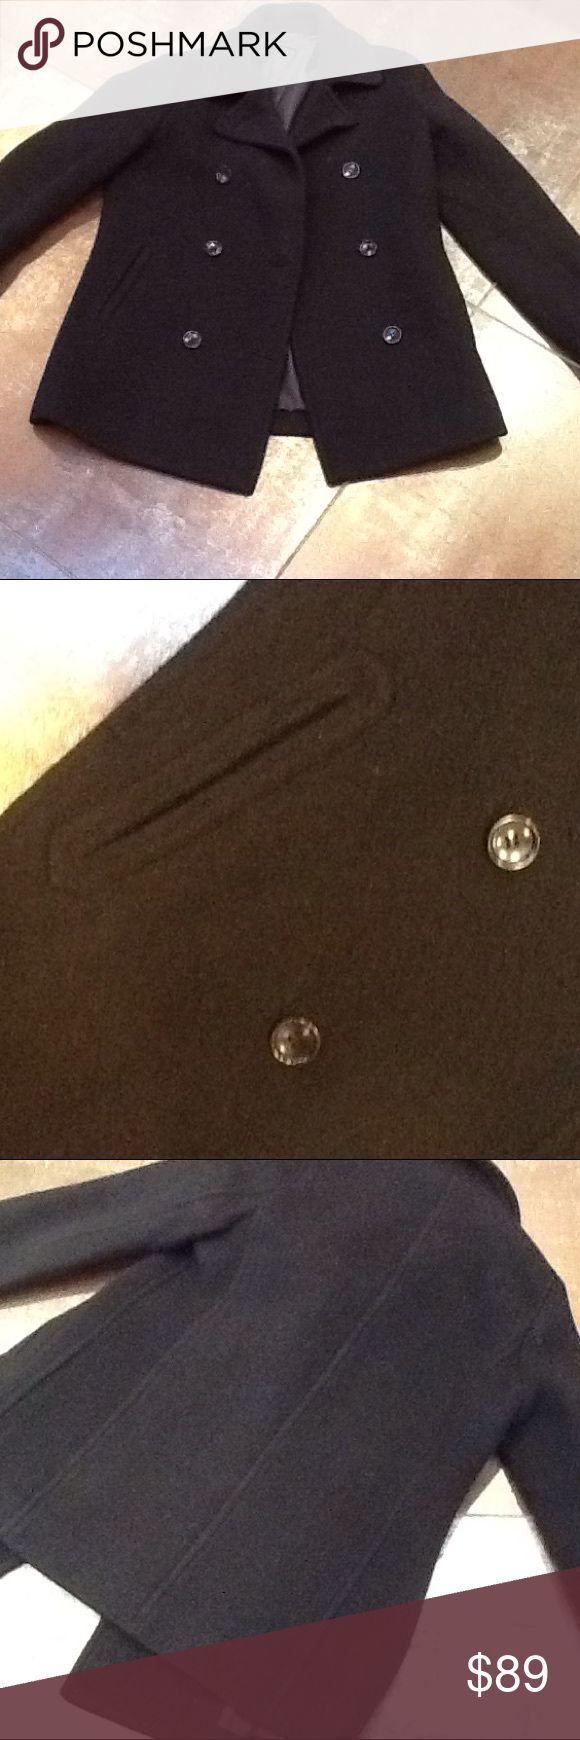 Uniglo Black pea coat uniglo Jackets & Coats Pea Coats